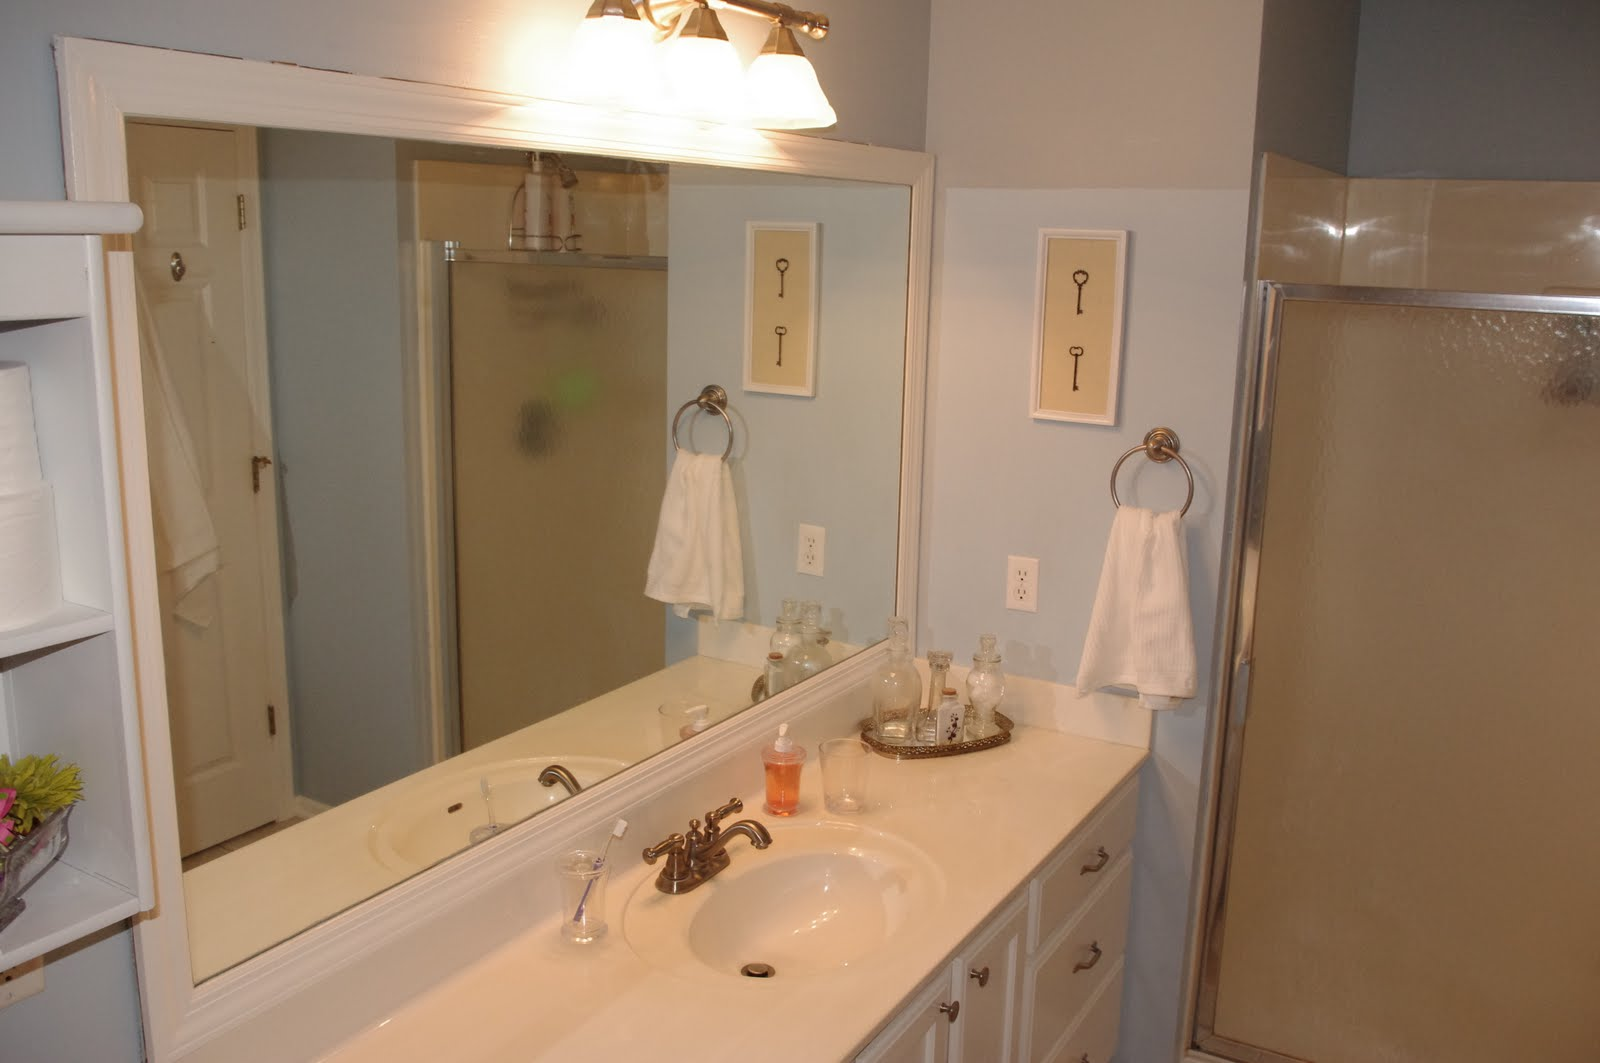 Cheetah Print Bathroom Set – Bathroom Knick Knacks